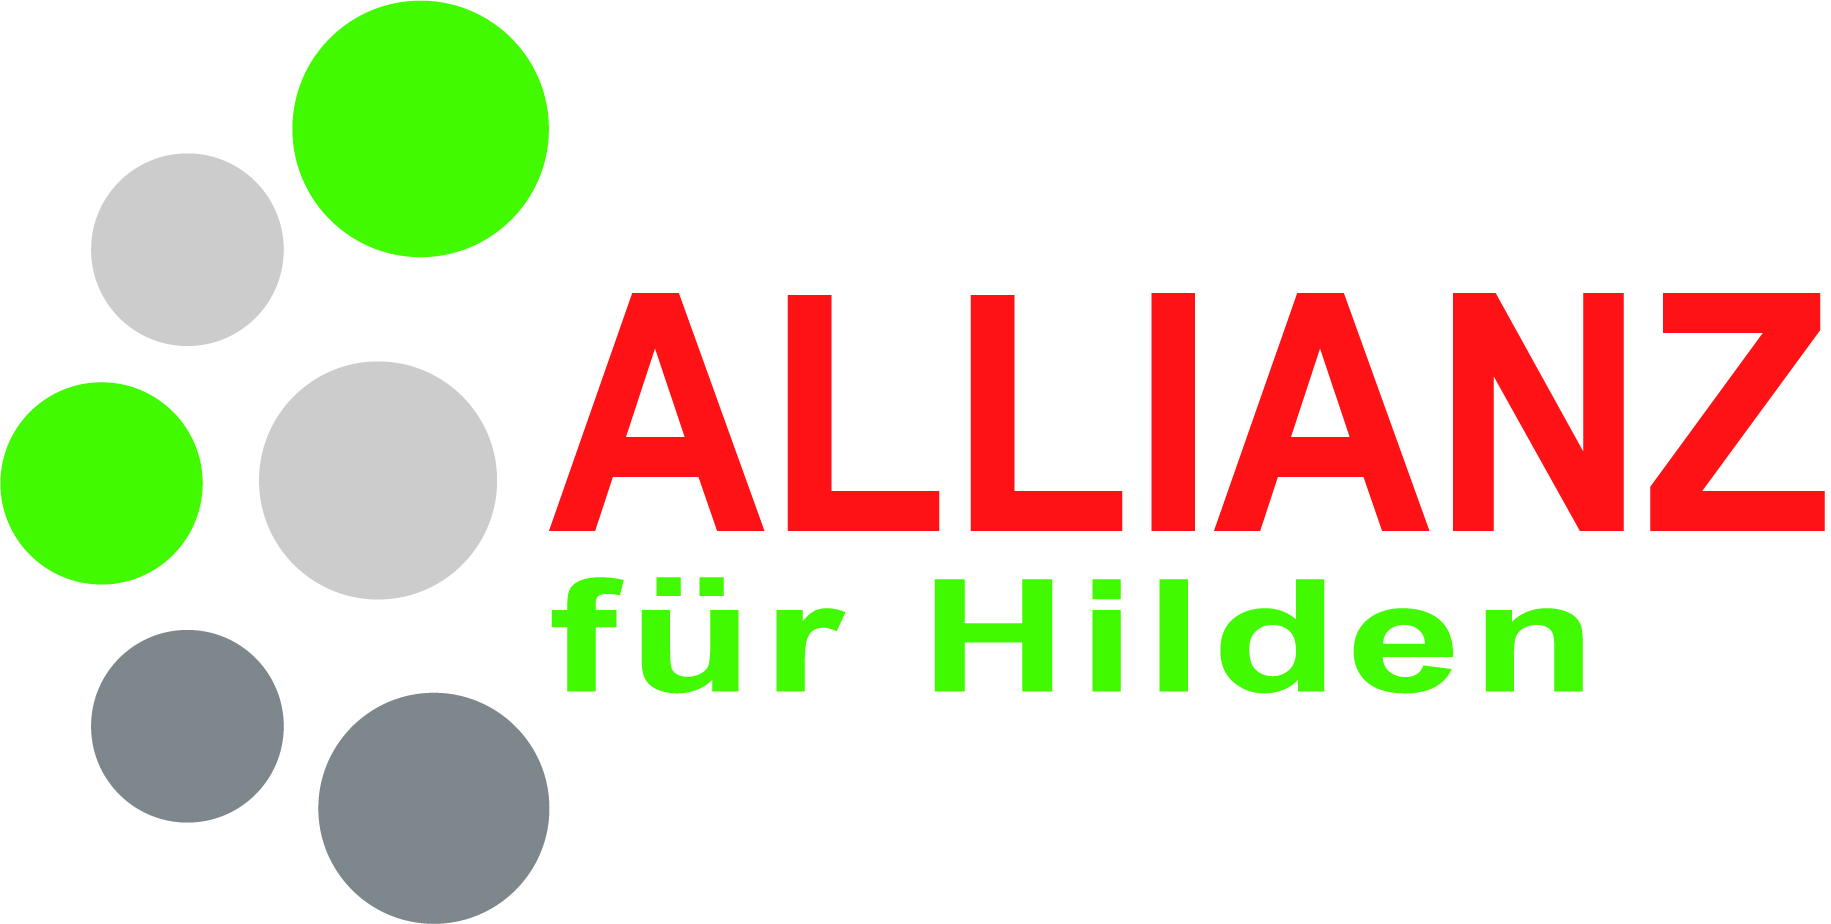 Allianz-HildenLogoU5kMyjLeJiFvm